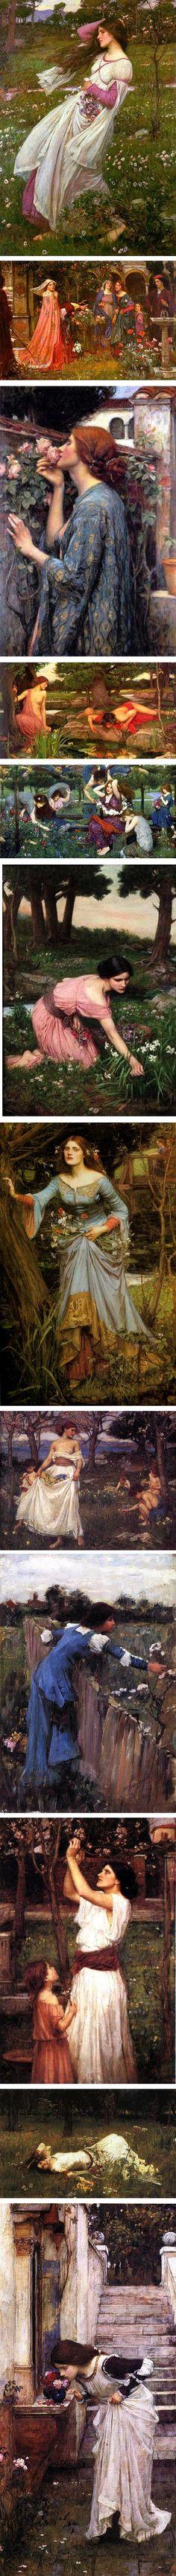 Welcoming Spring with John William Waterhouse